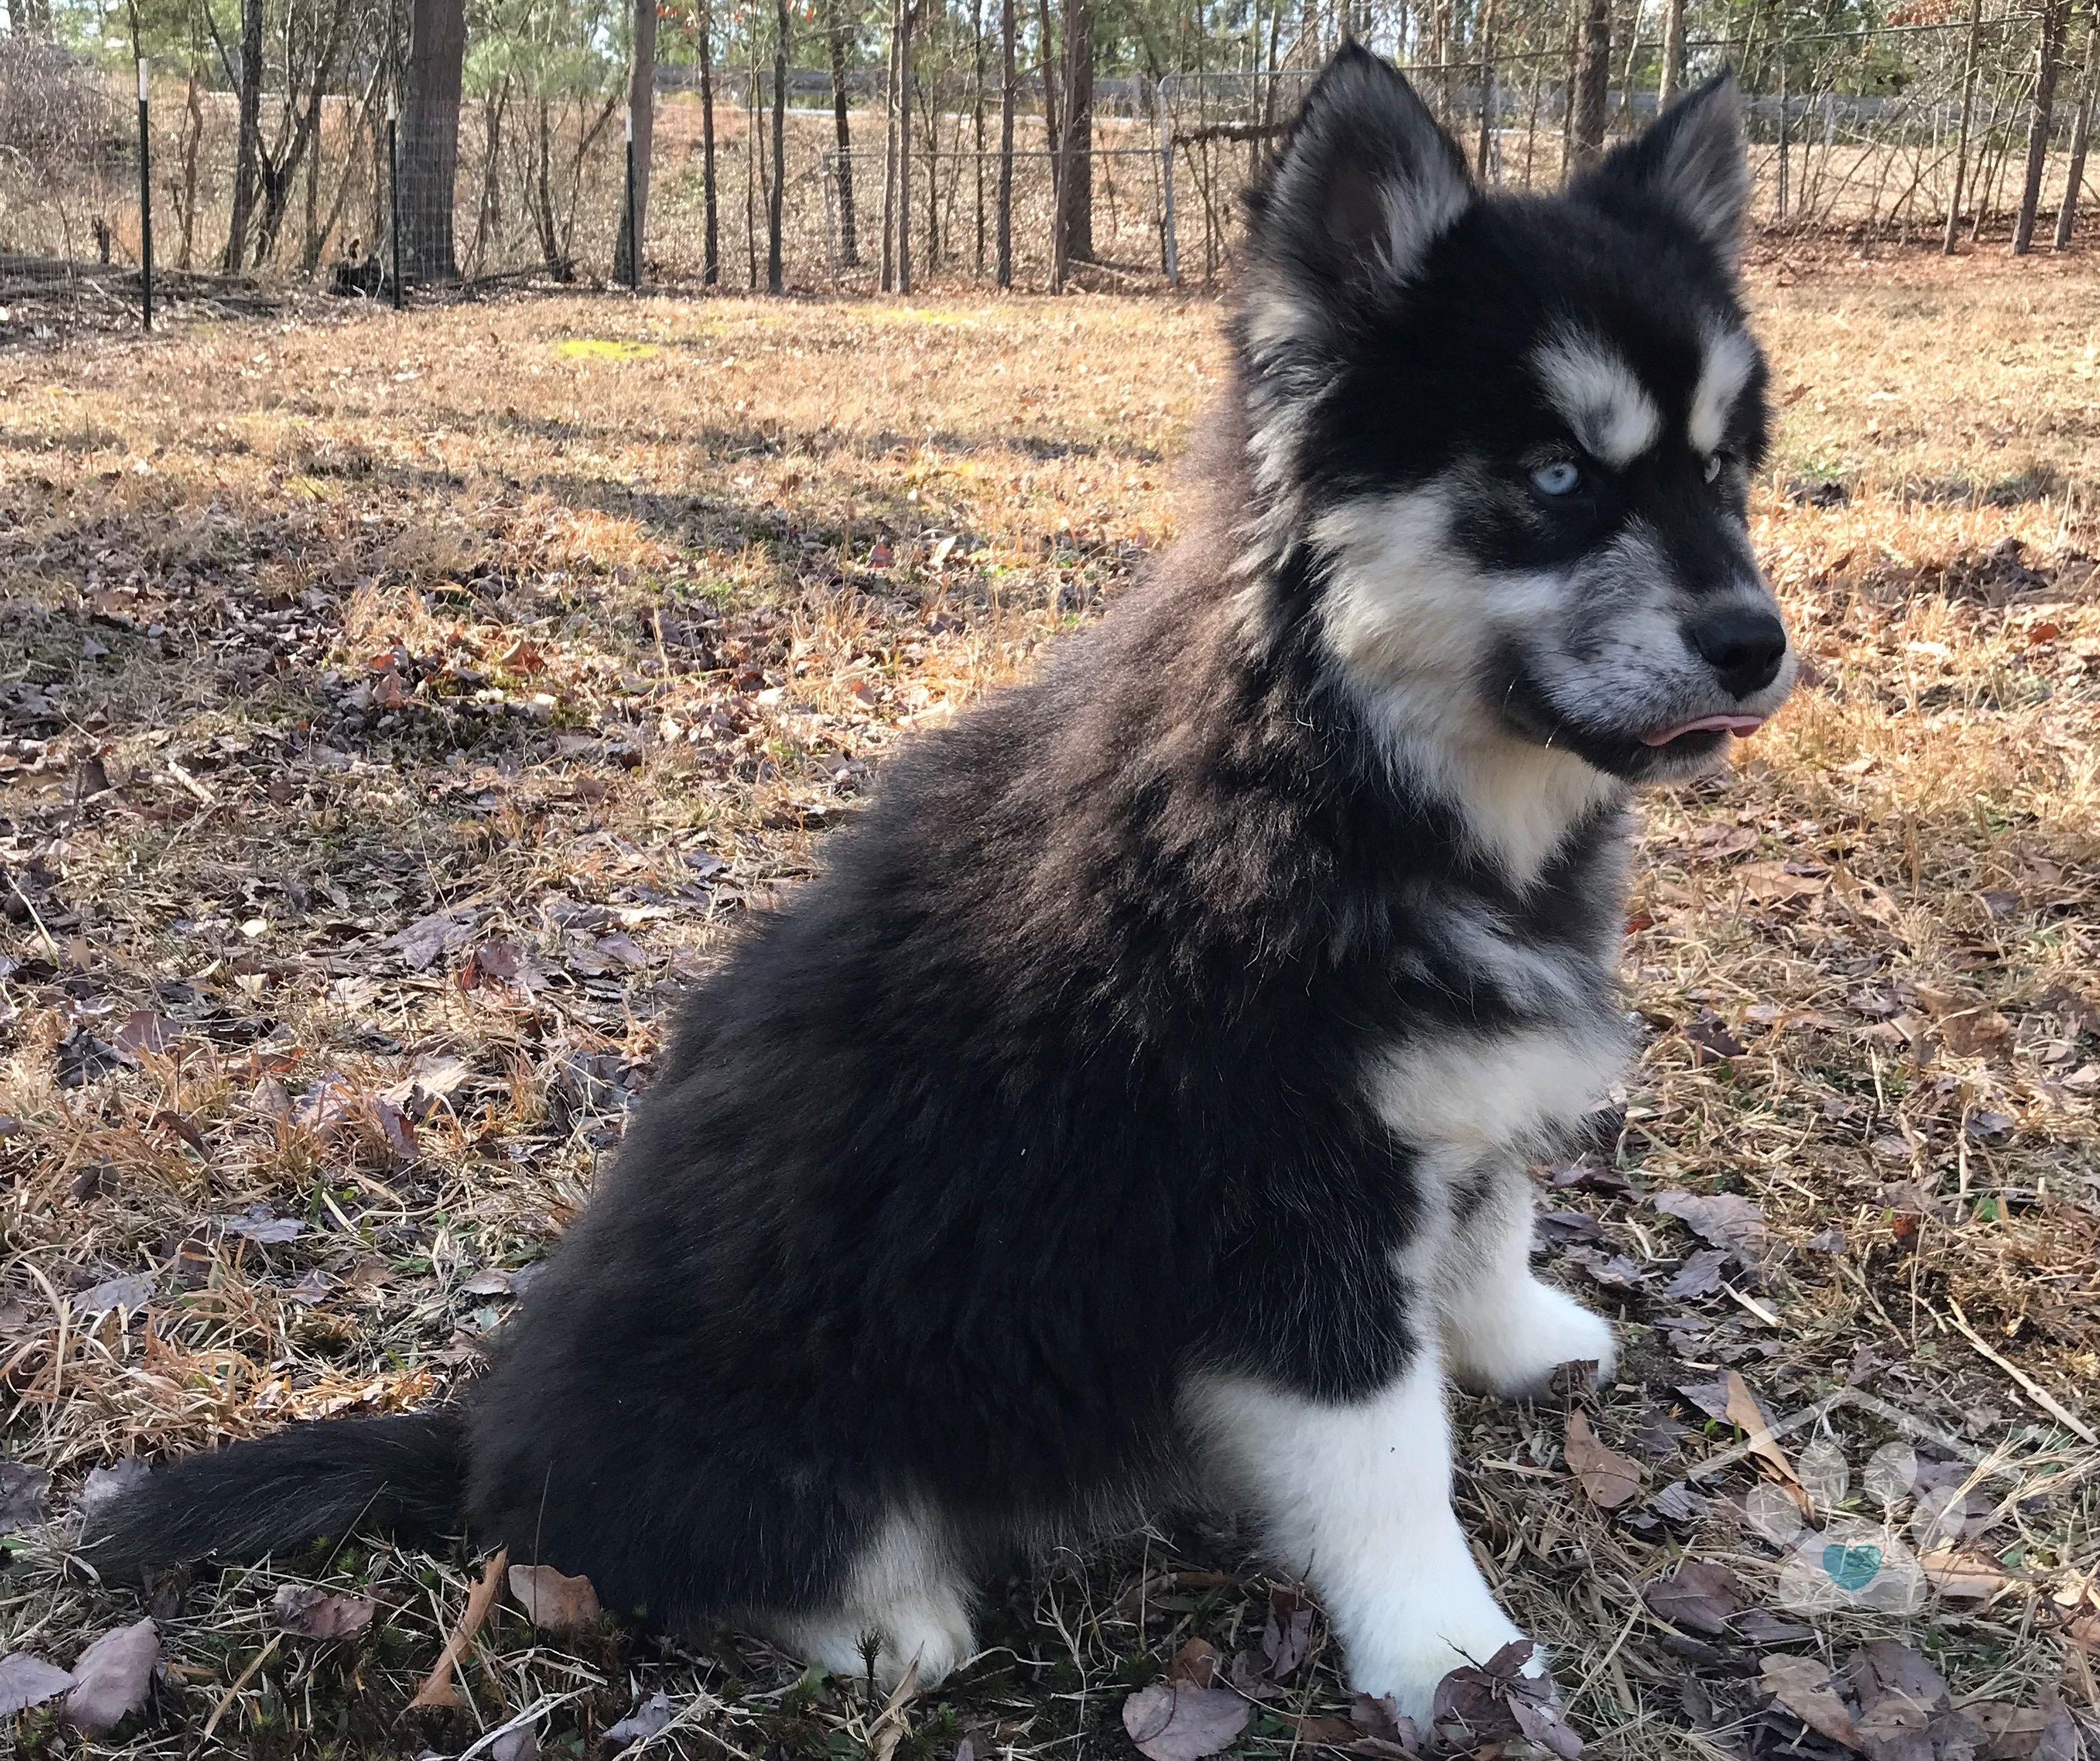 Meet Mischa! She is a Black and White Siberian Husky